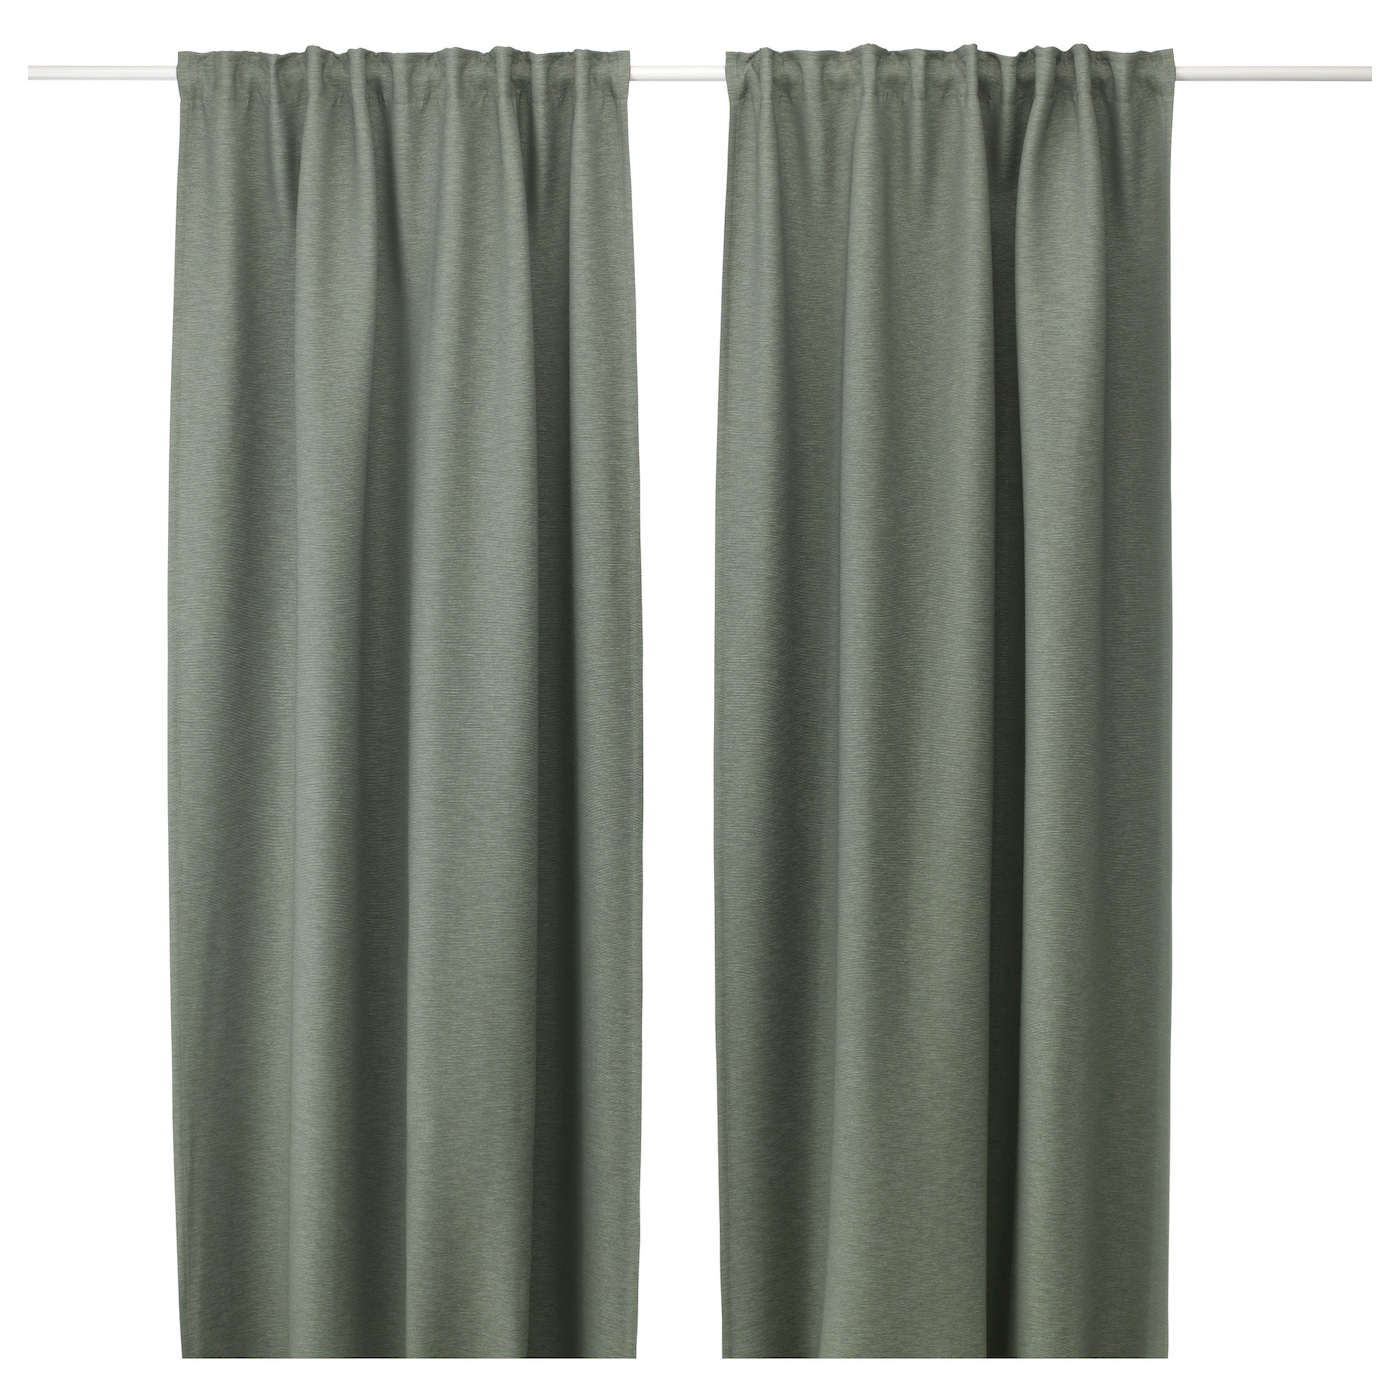 vilborg curtains 1 pair green 145x250 cm ikea. Black Bedroom Furniture Sets. Home Design Ideas